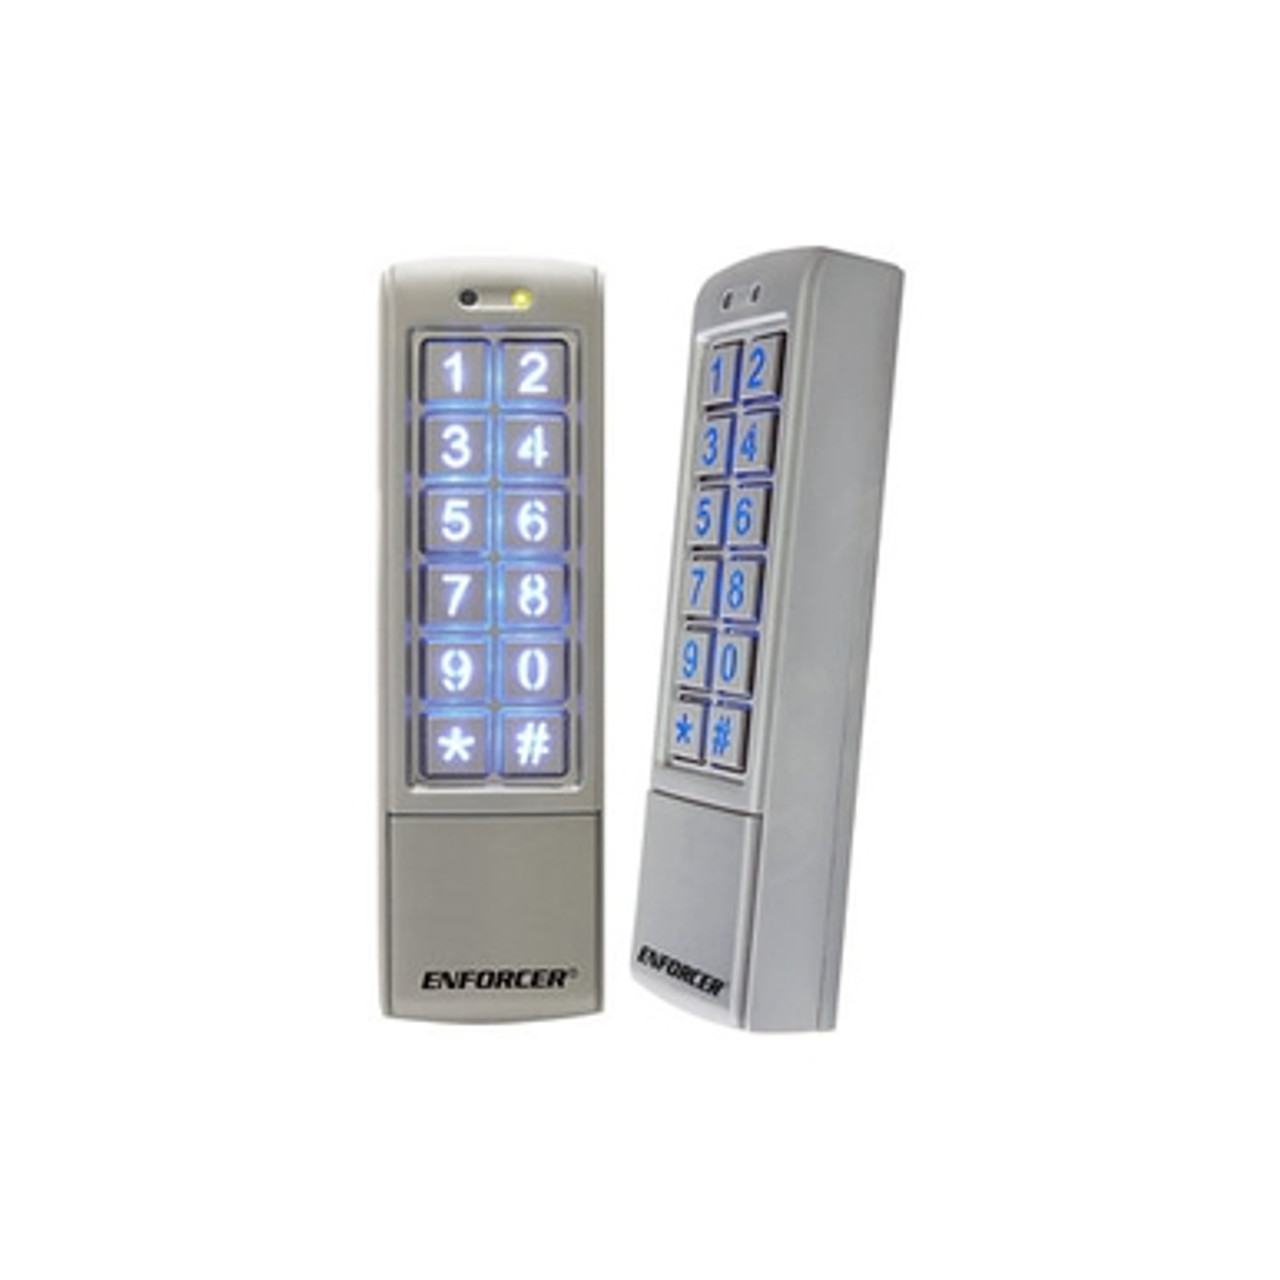 seco larm sk 2323 spq mullion style outdoor digital access keypad. Black Bedroom Furniture Sets. Home Design Ideas